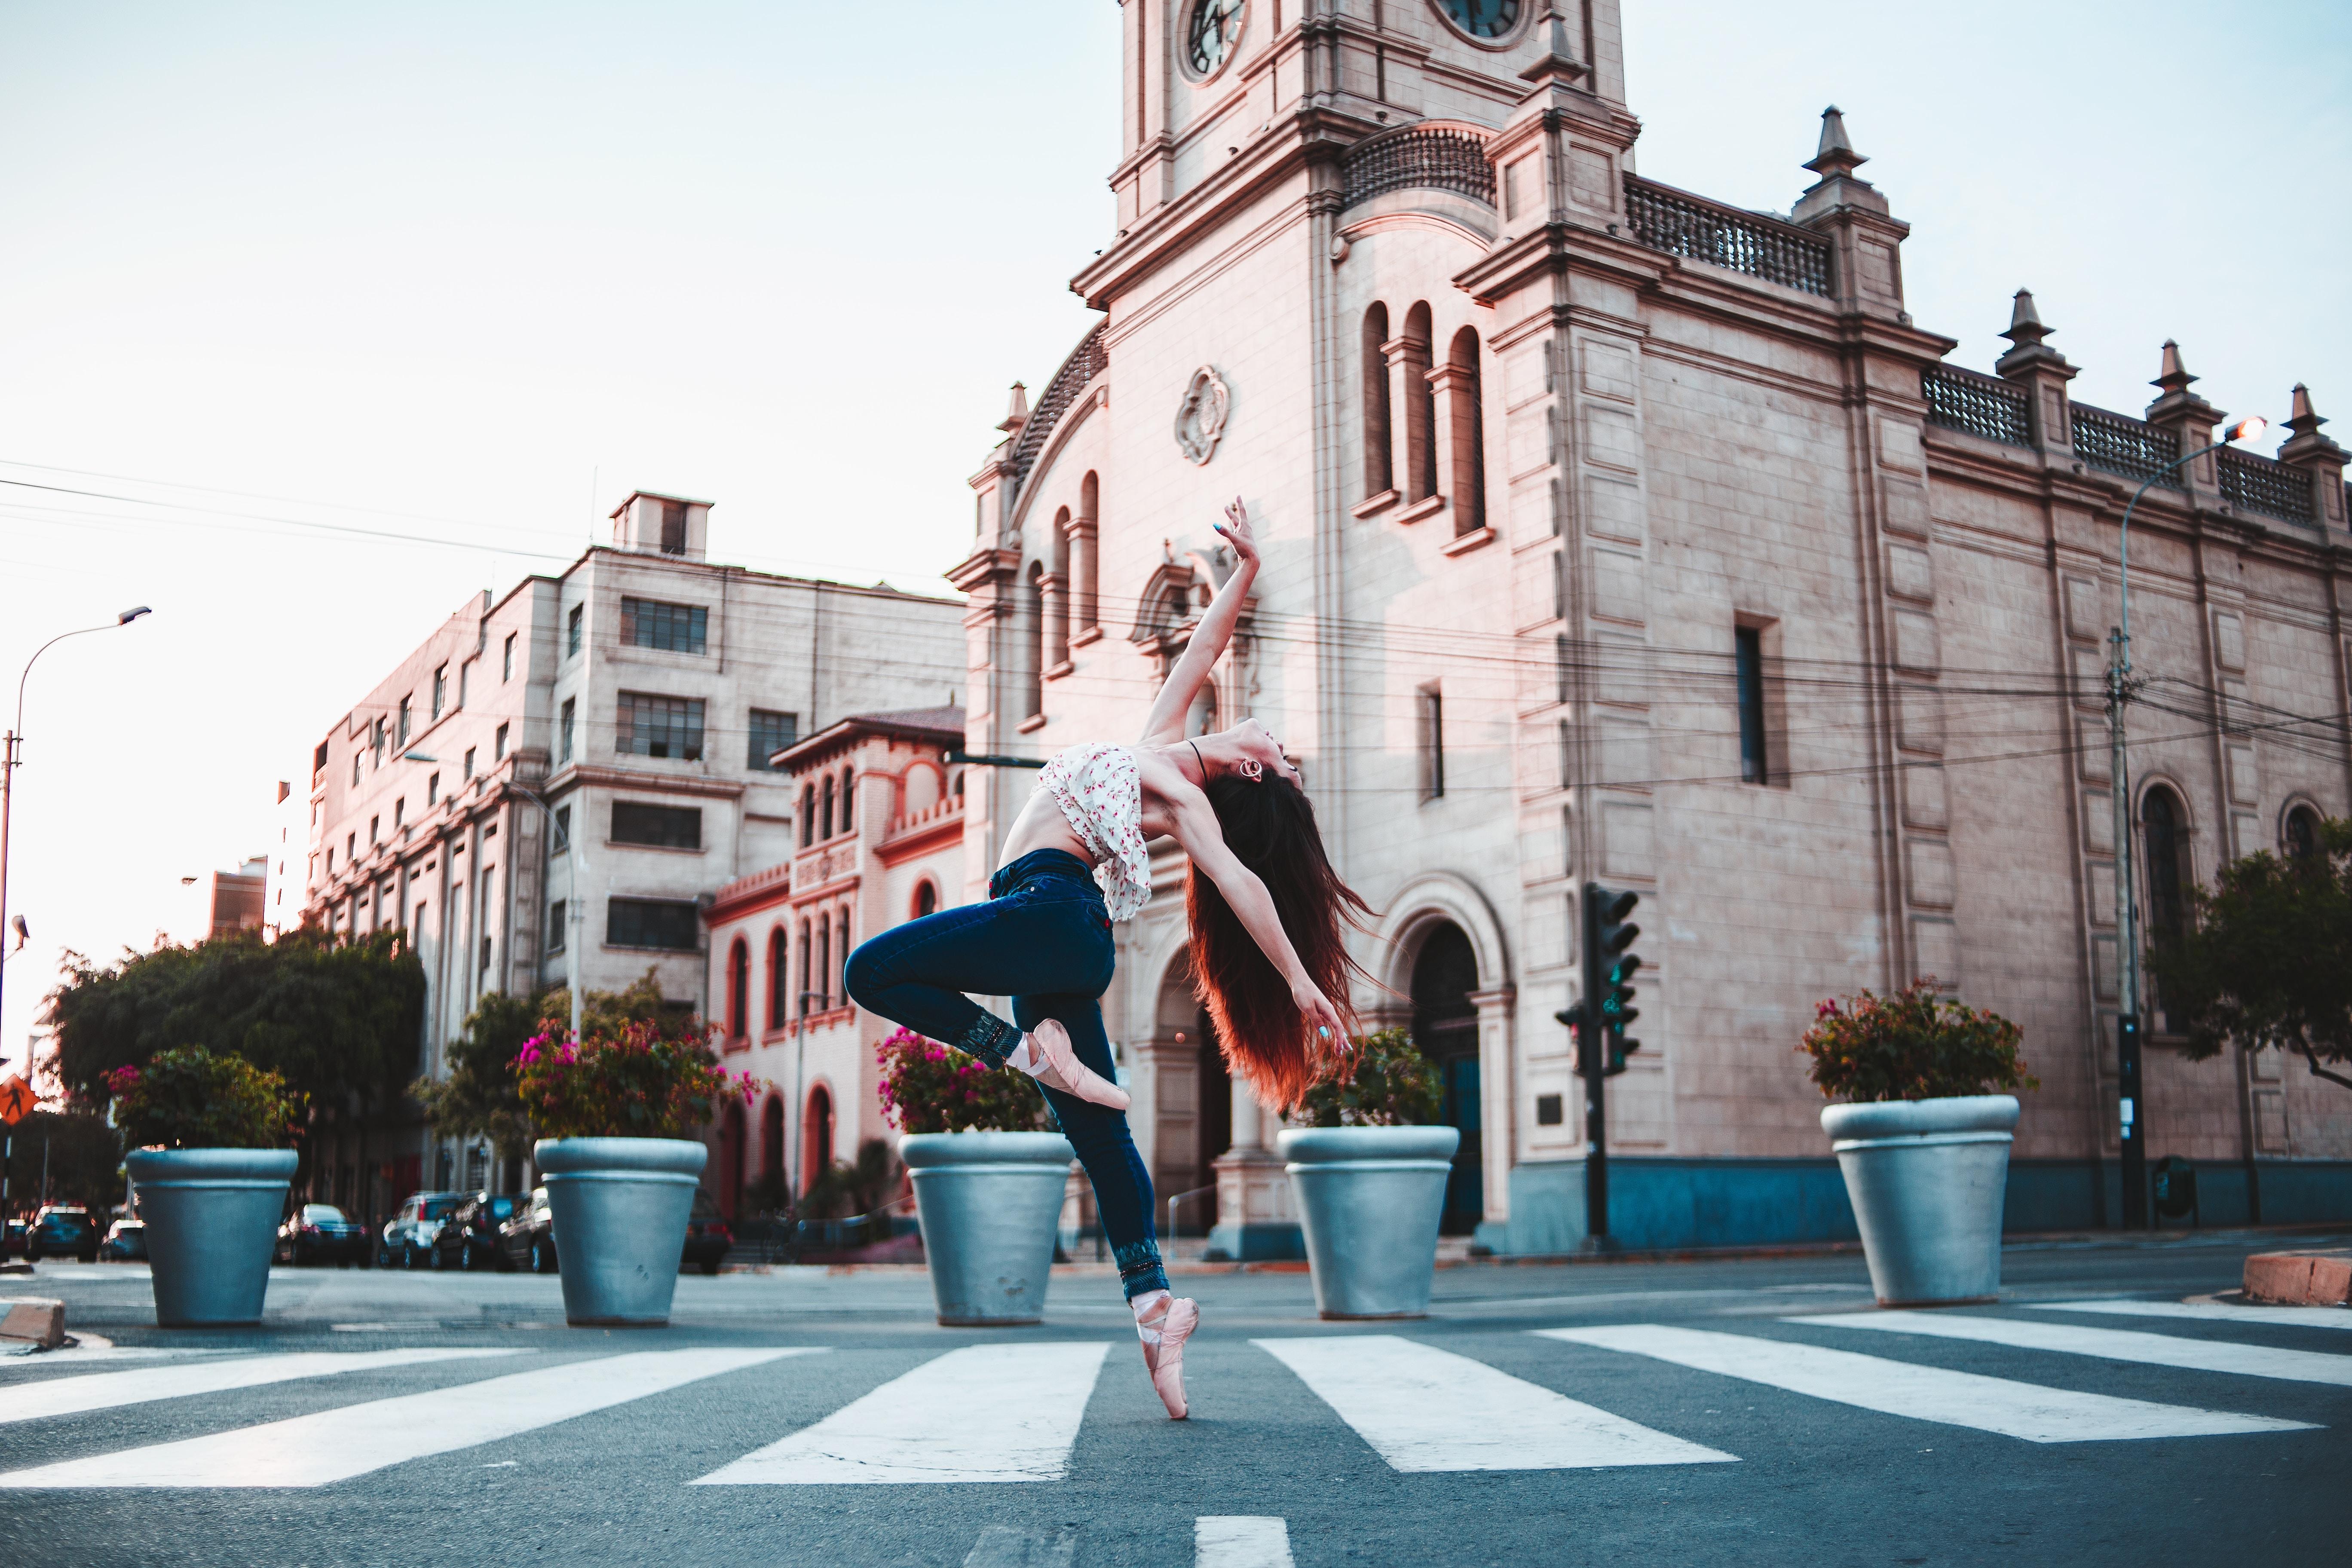 woman dancing on street